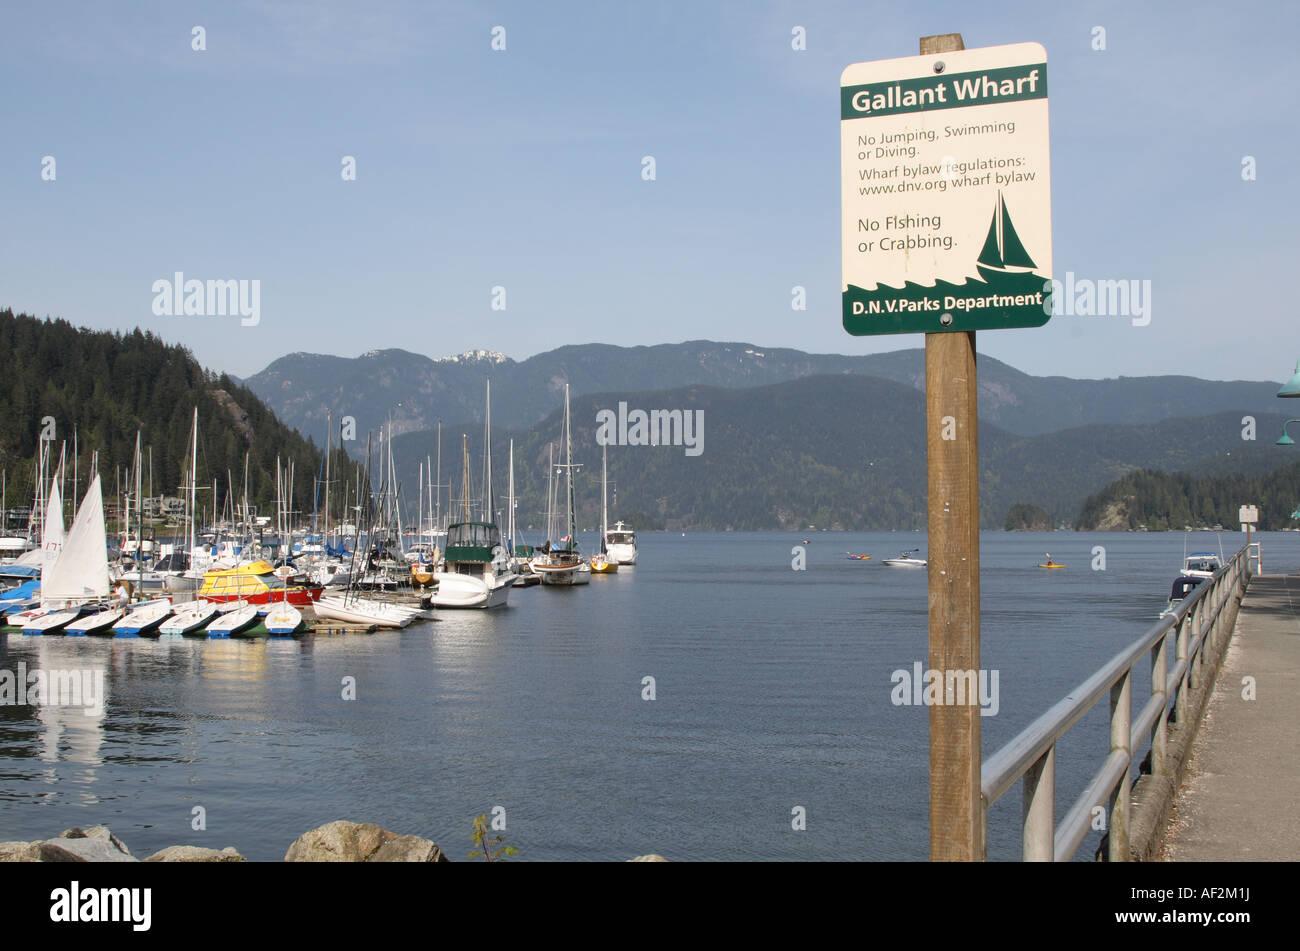 Deep Cove, North Vancouver, British Columbia, Canada - Stock Image